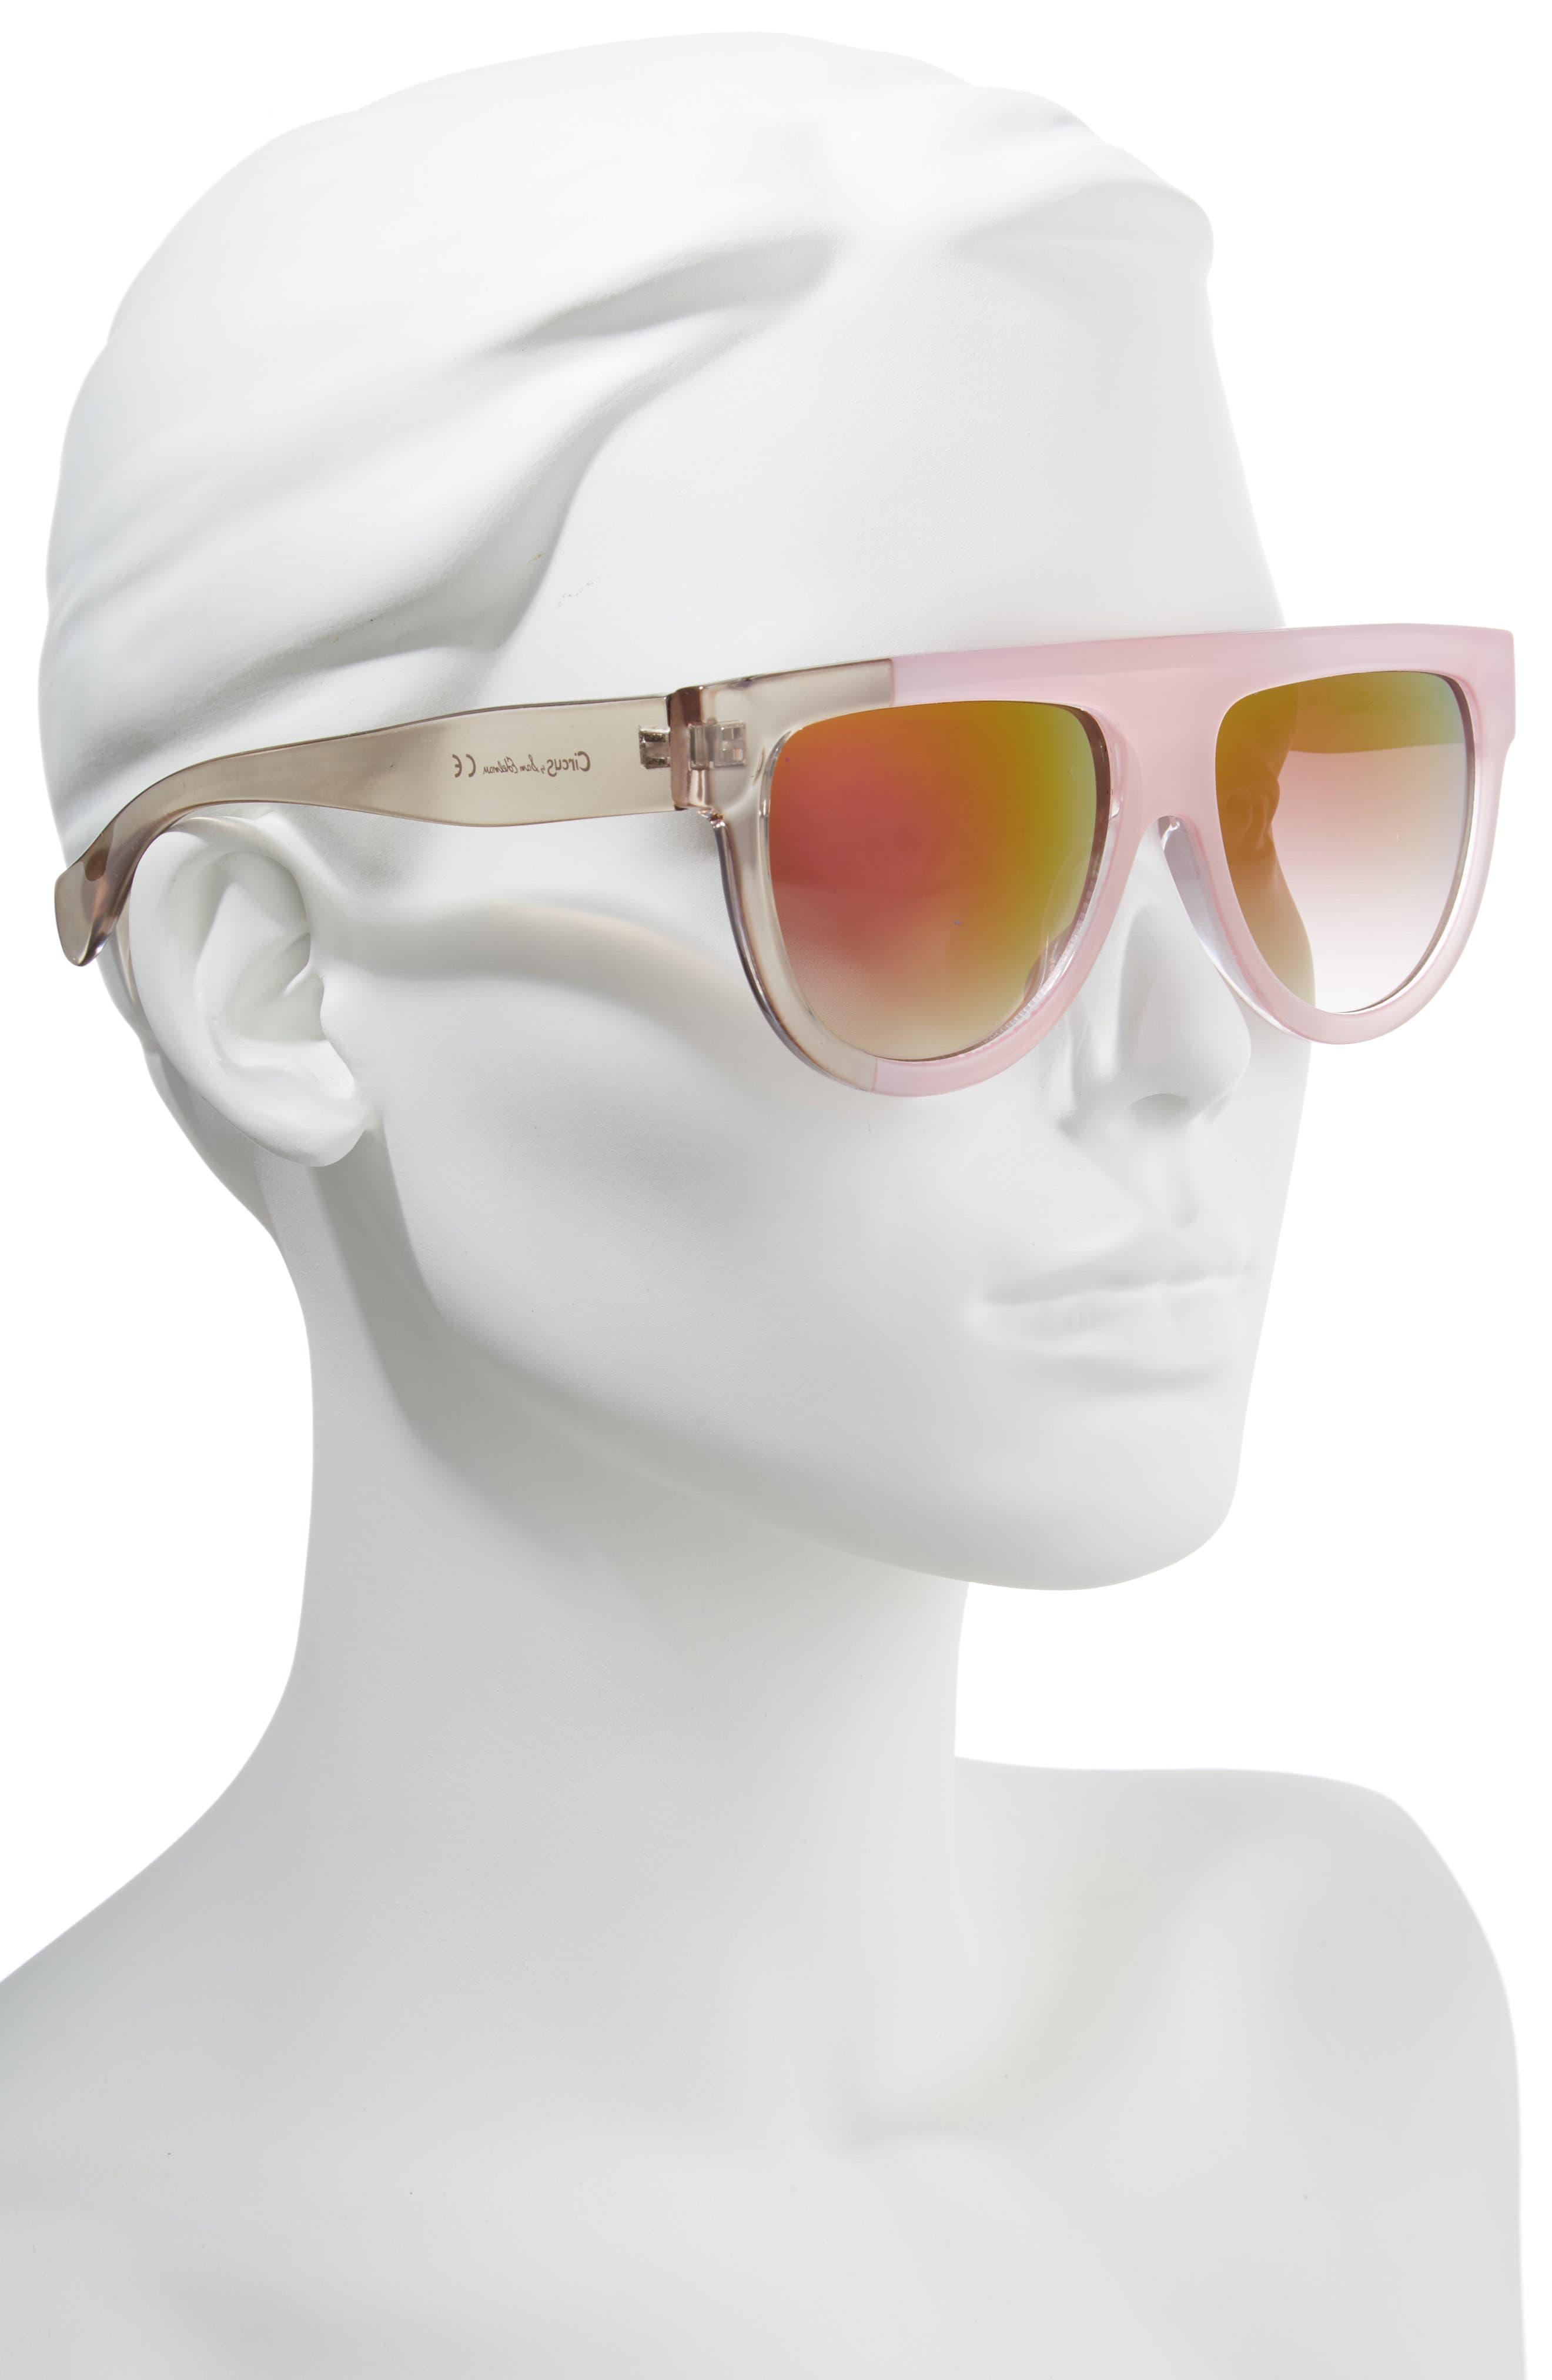 68mm Flat Top Sunglasses,                             Alternate thumbnail 4, color,